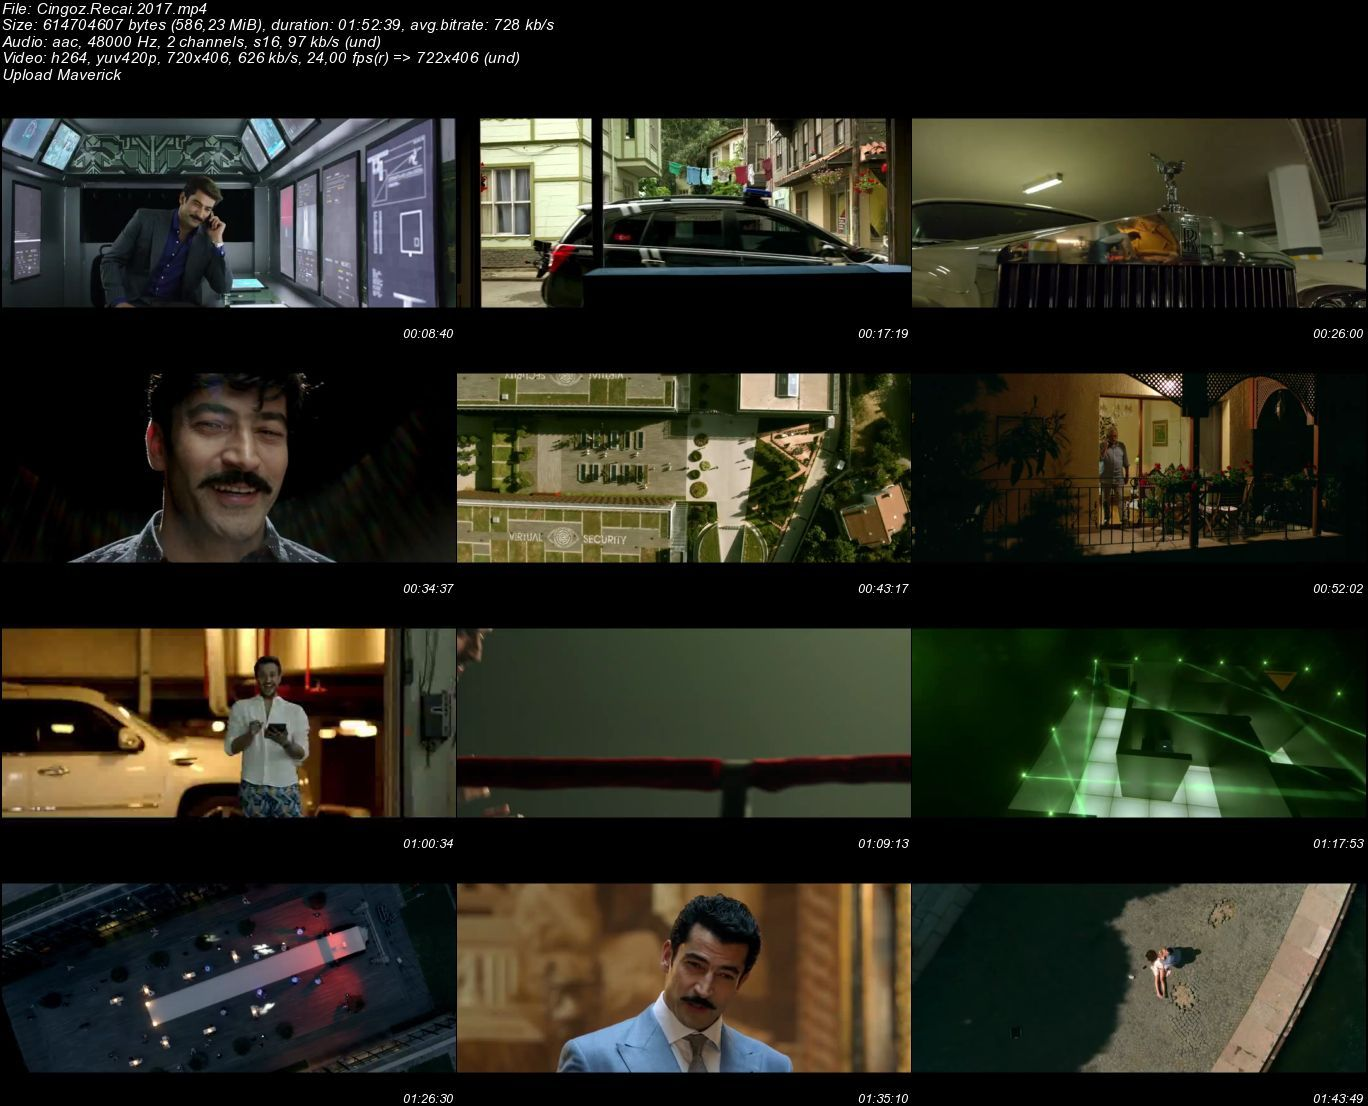 Cingöz Recai - 2017 (Yerli Film) Mp4 indir